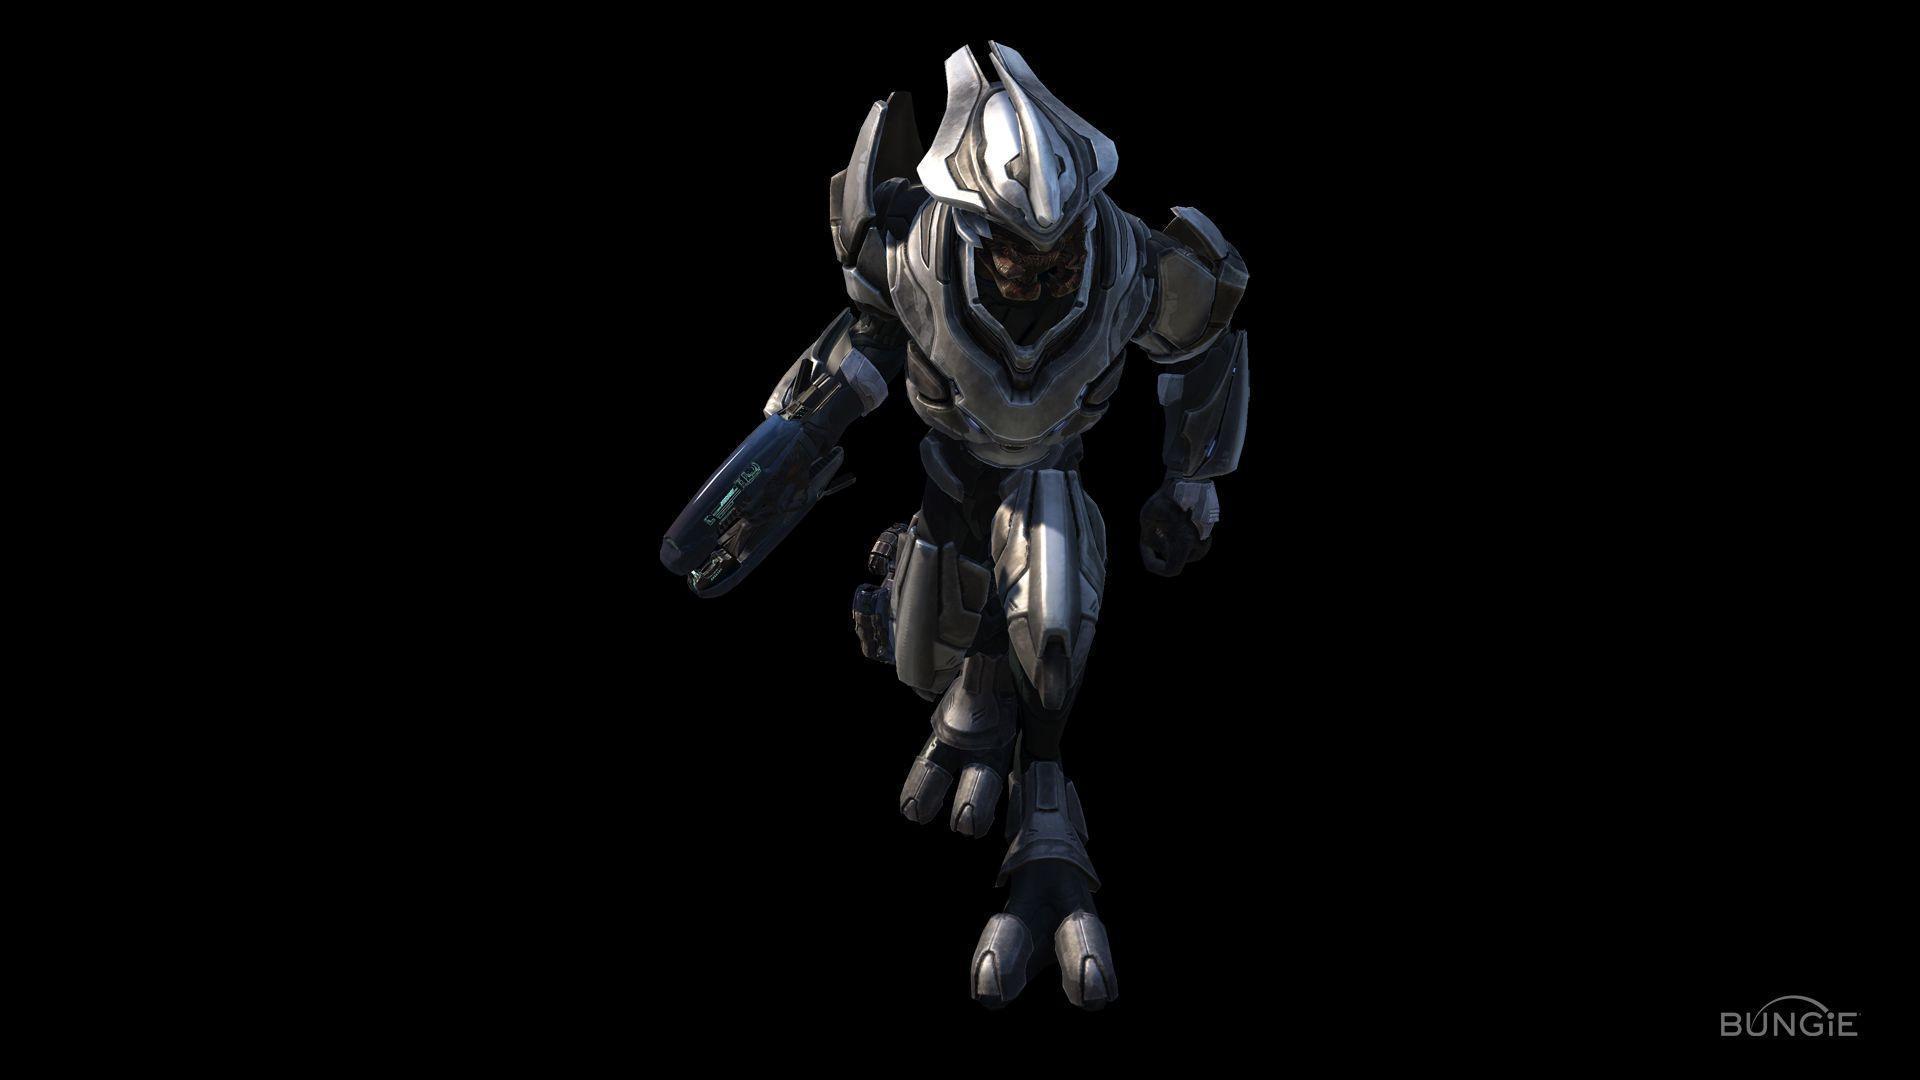 Halo 4 Elite Wallpapers - Wallpaper Cave